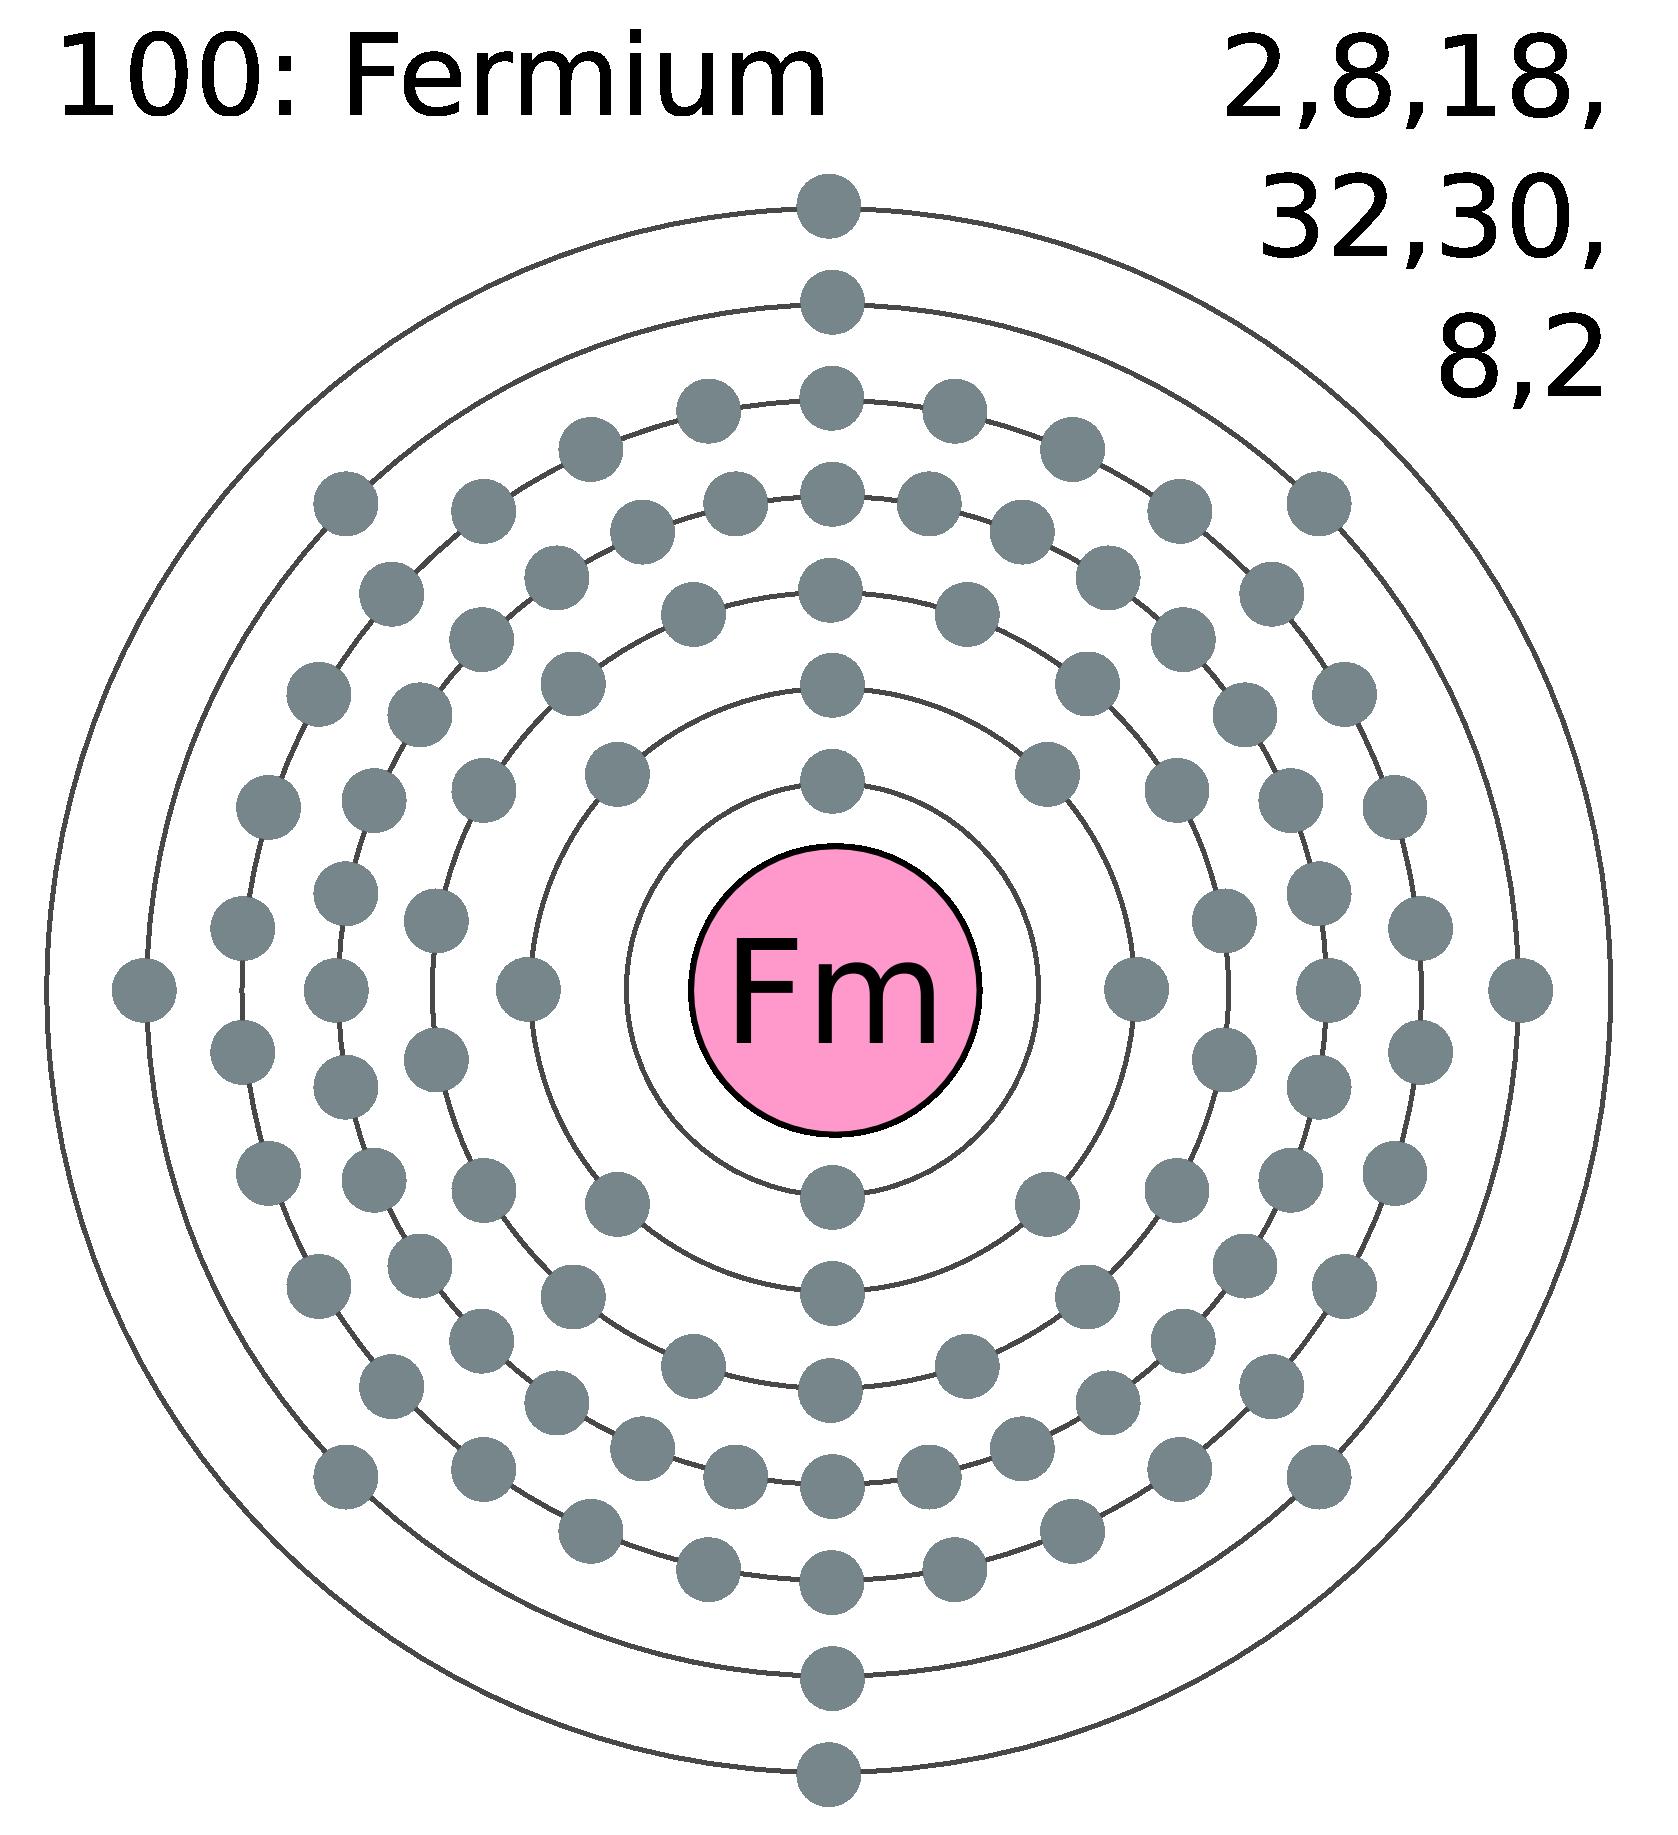 File:Electron_shell_100_fermium on Atomic Size Periodic Table